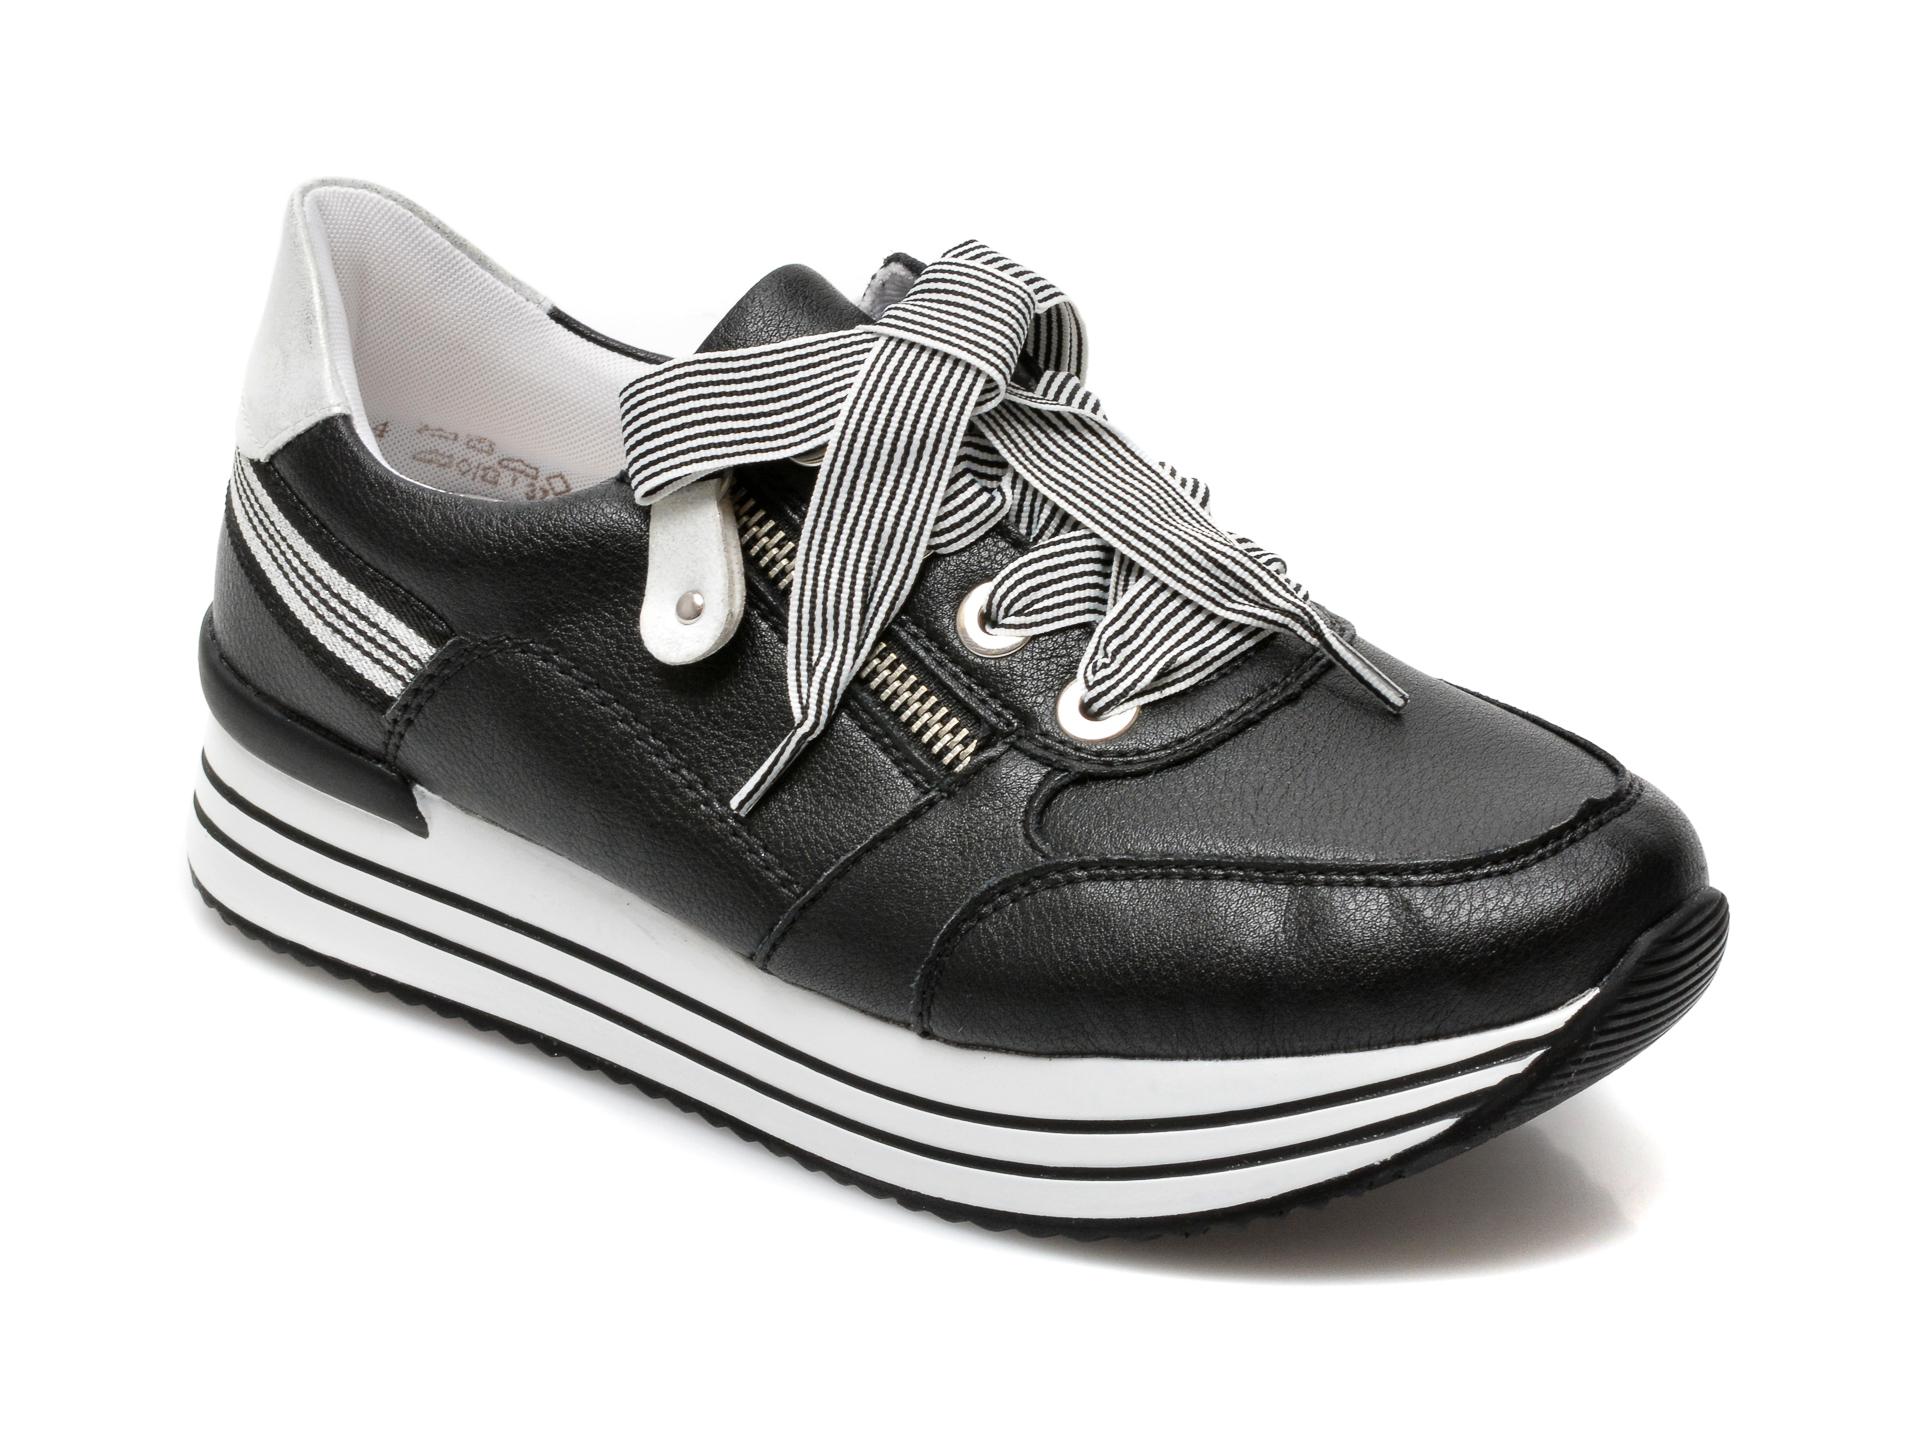 Pantofi REMONTE negri, D1312, din piele naturala